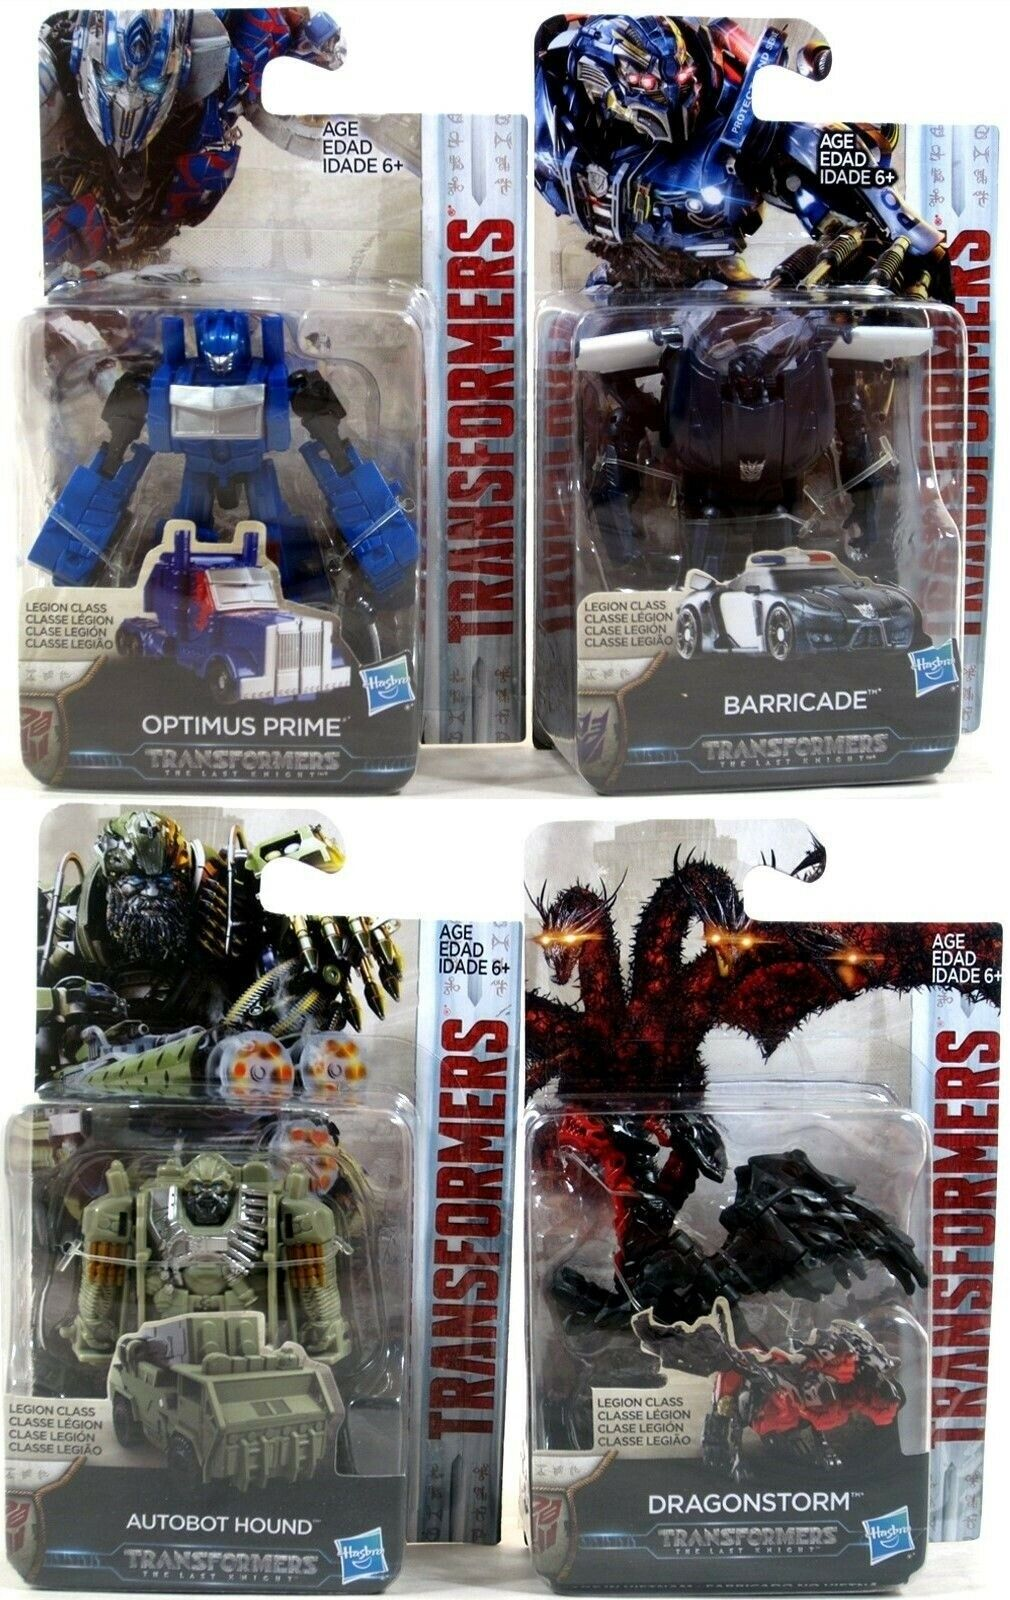 Set of 4: Transformers: The Last Knight Legion Class Wave 1